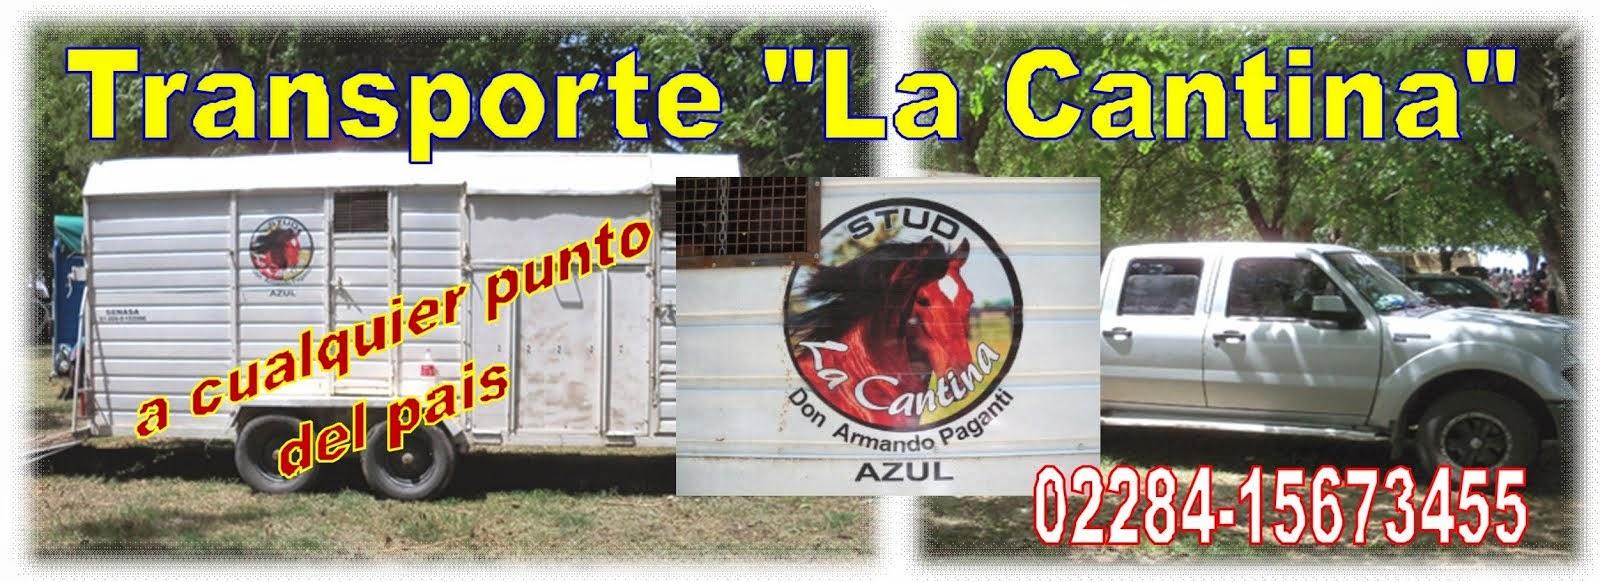 Transporte La Cantina